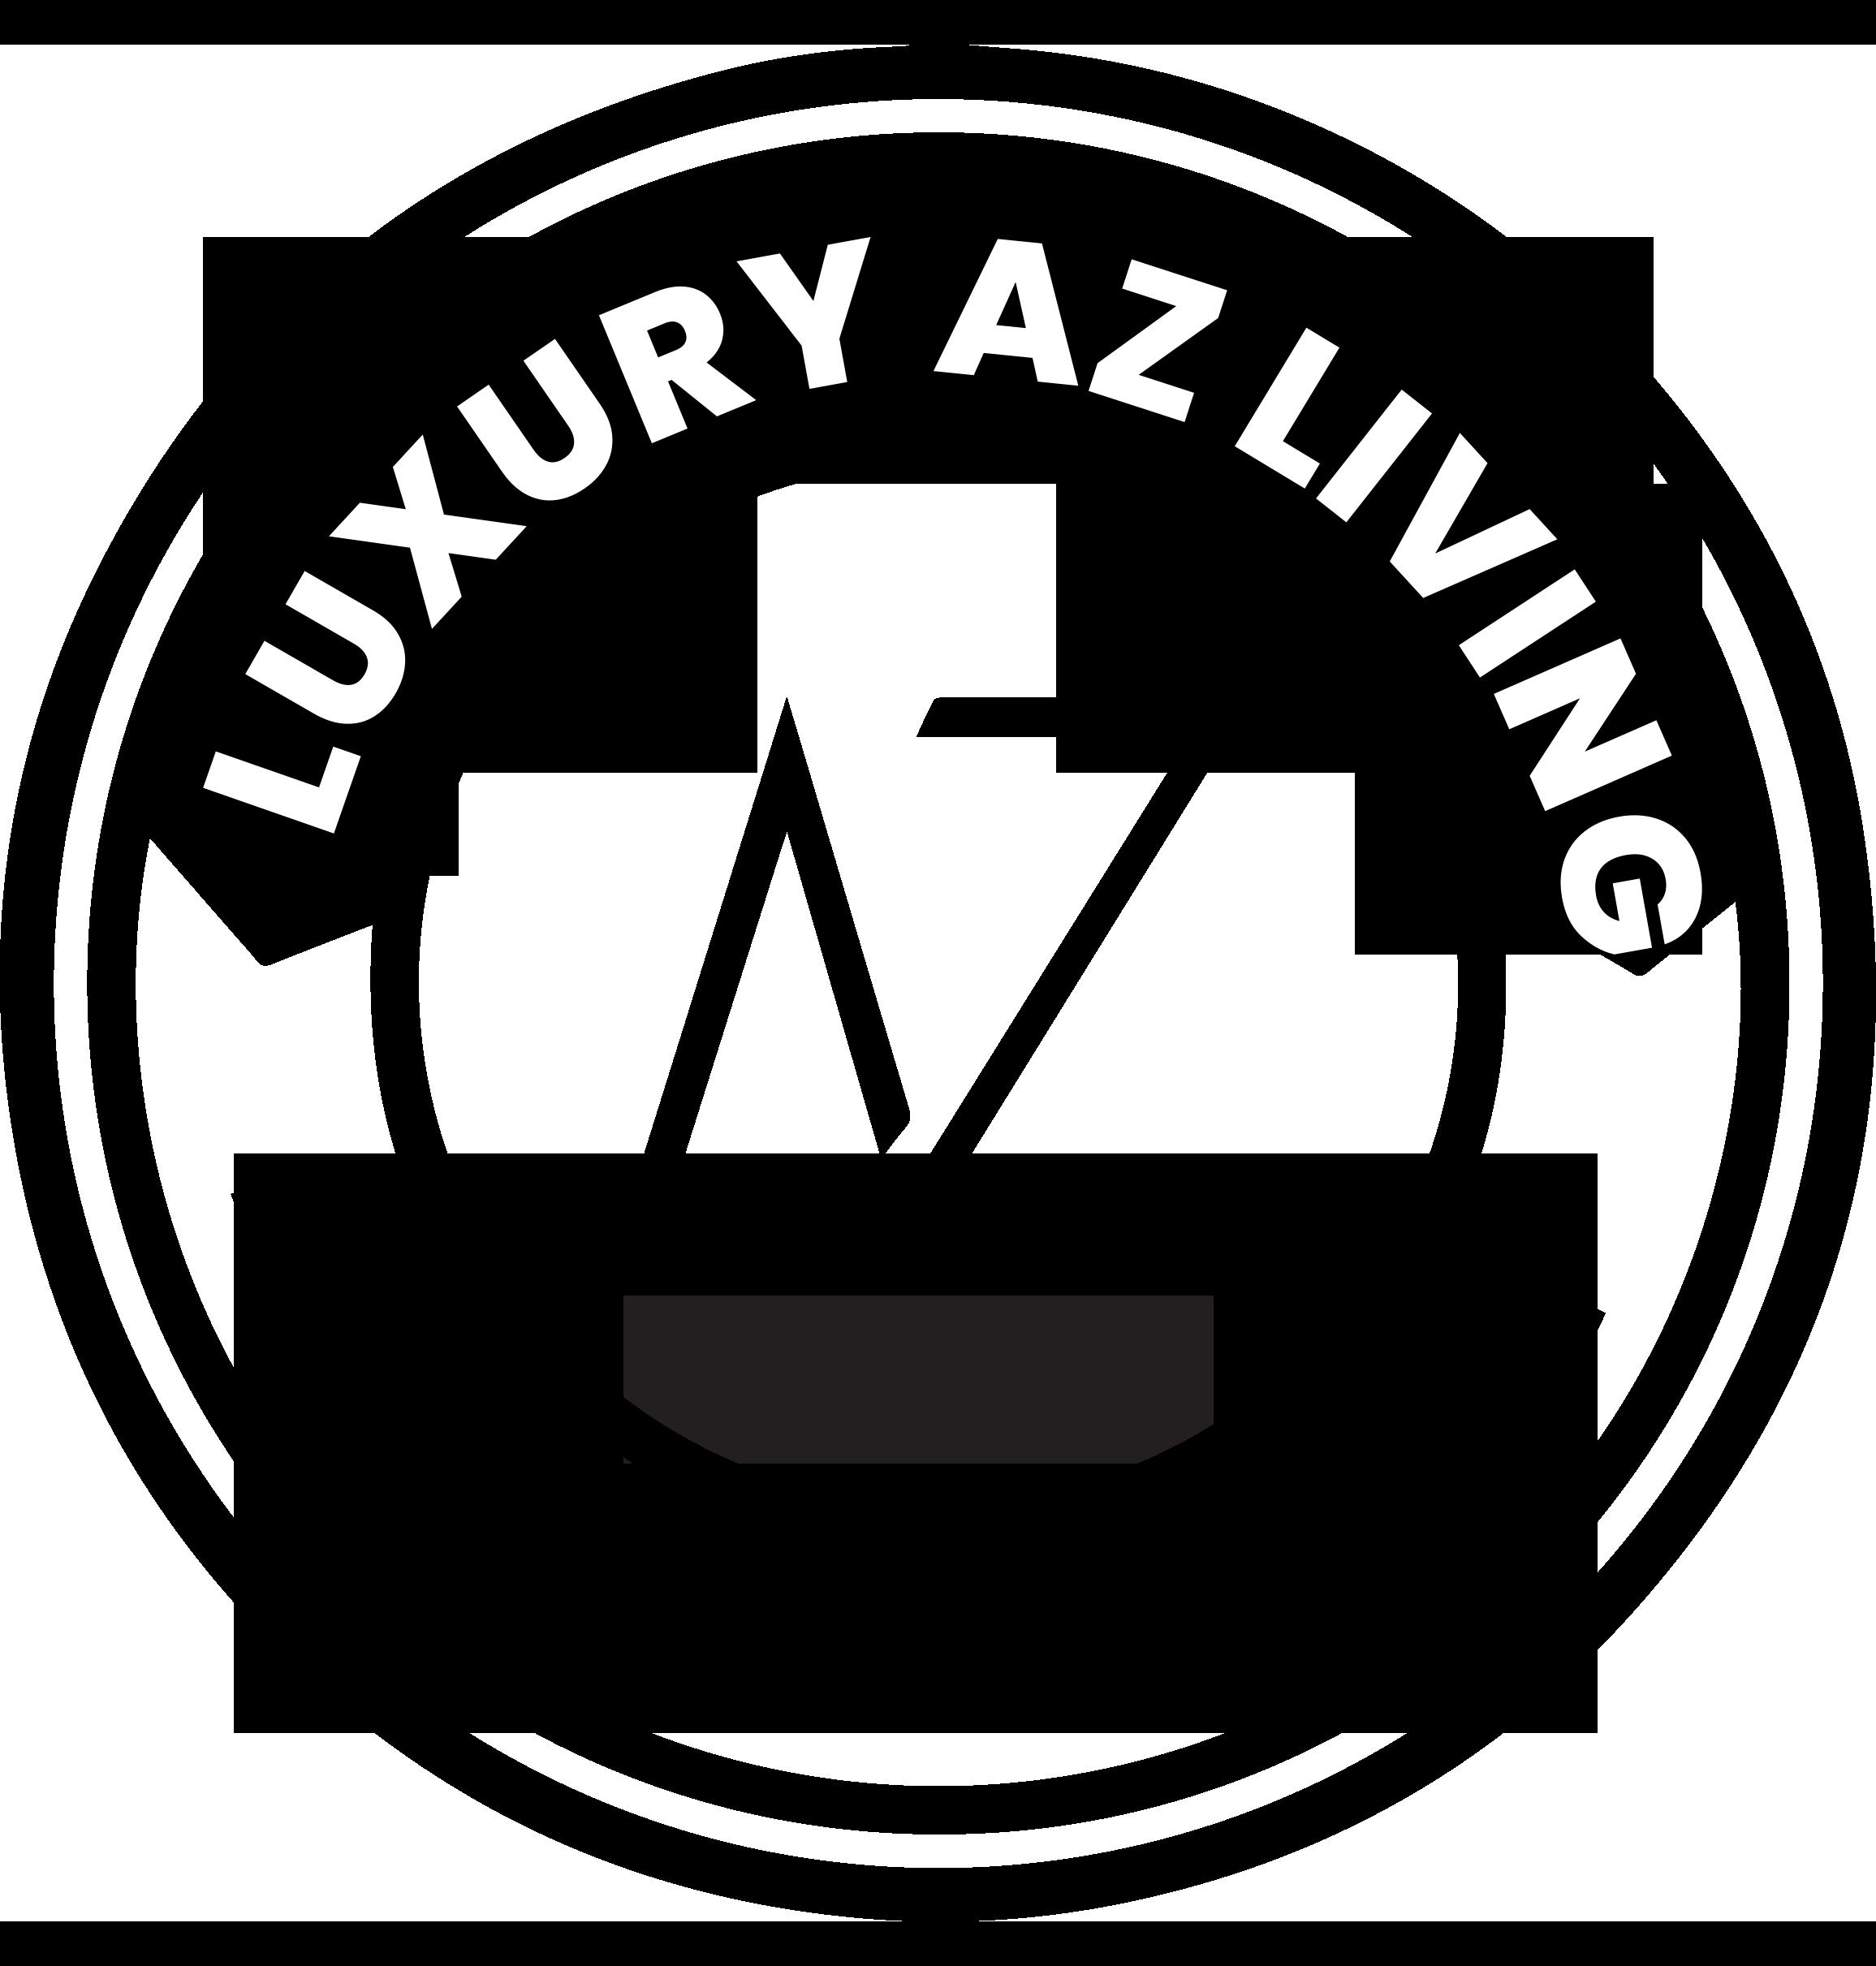 Luxury Az Living - My Home Group